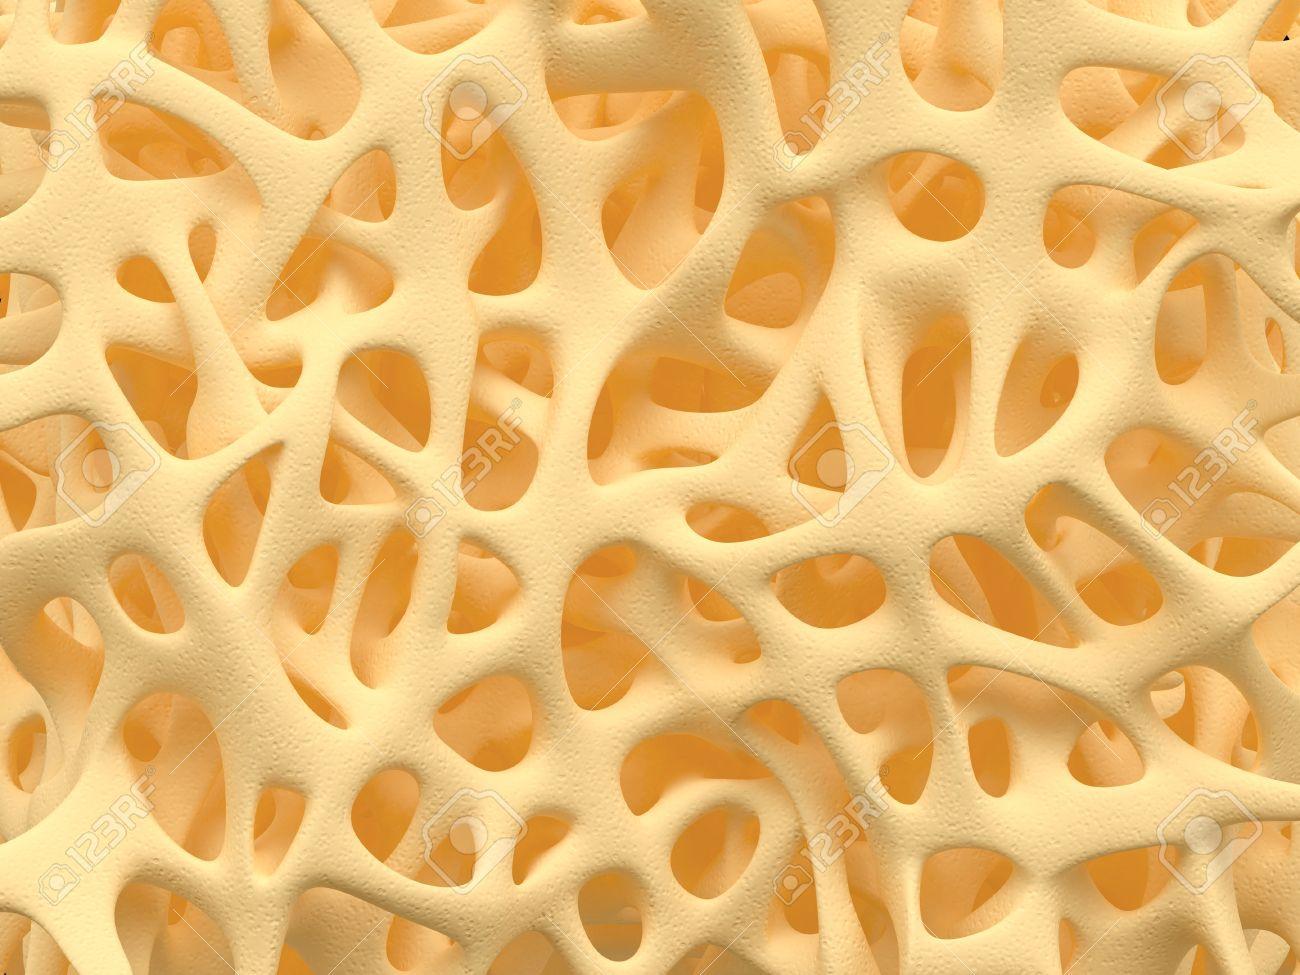 Bone spongy structure close-up, healthy texture of bone - 35870563